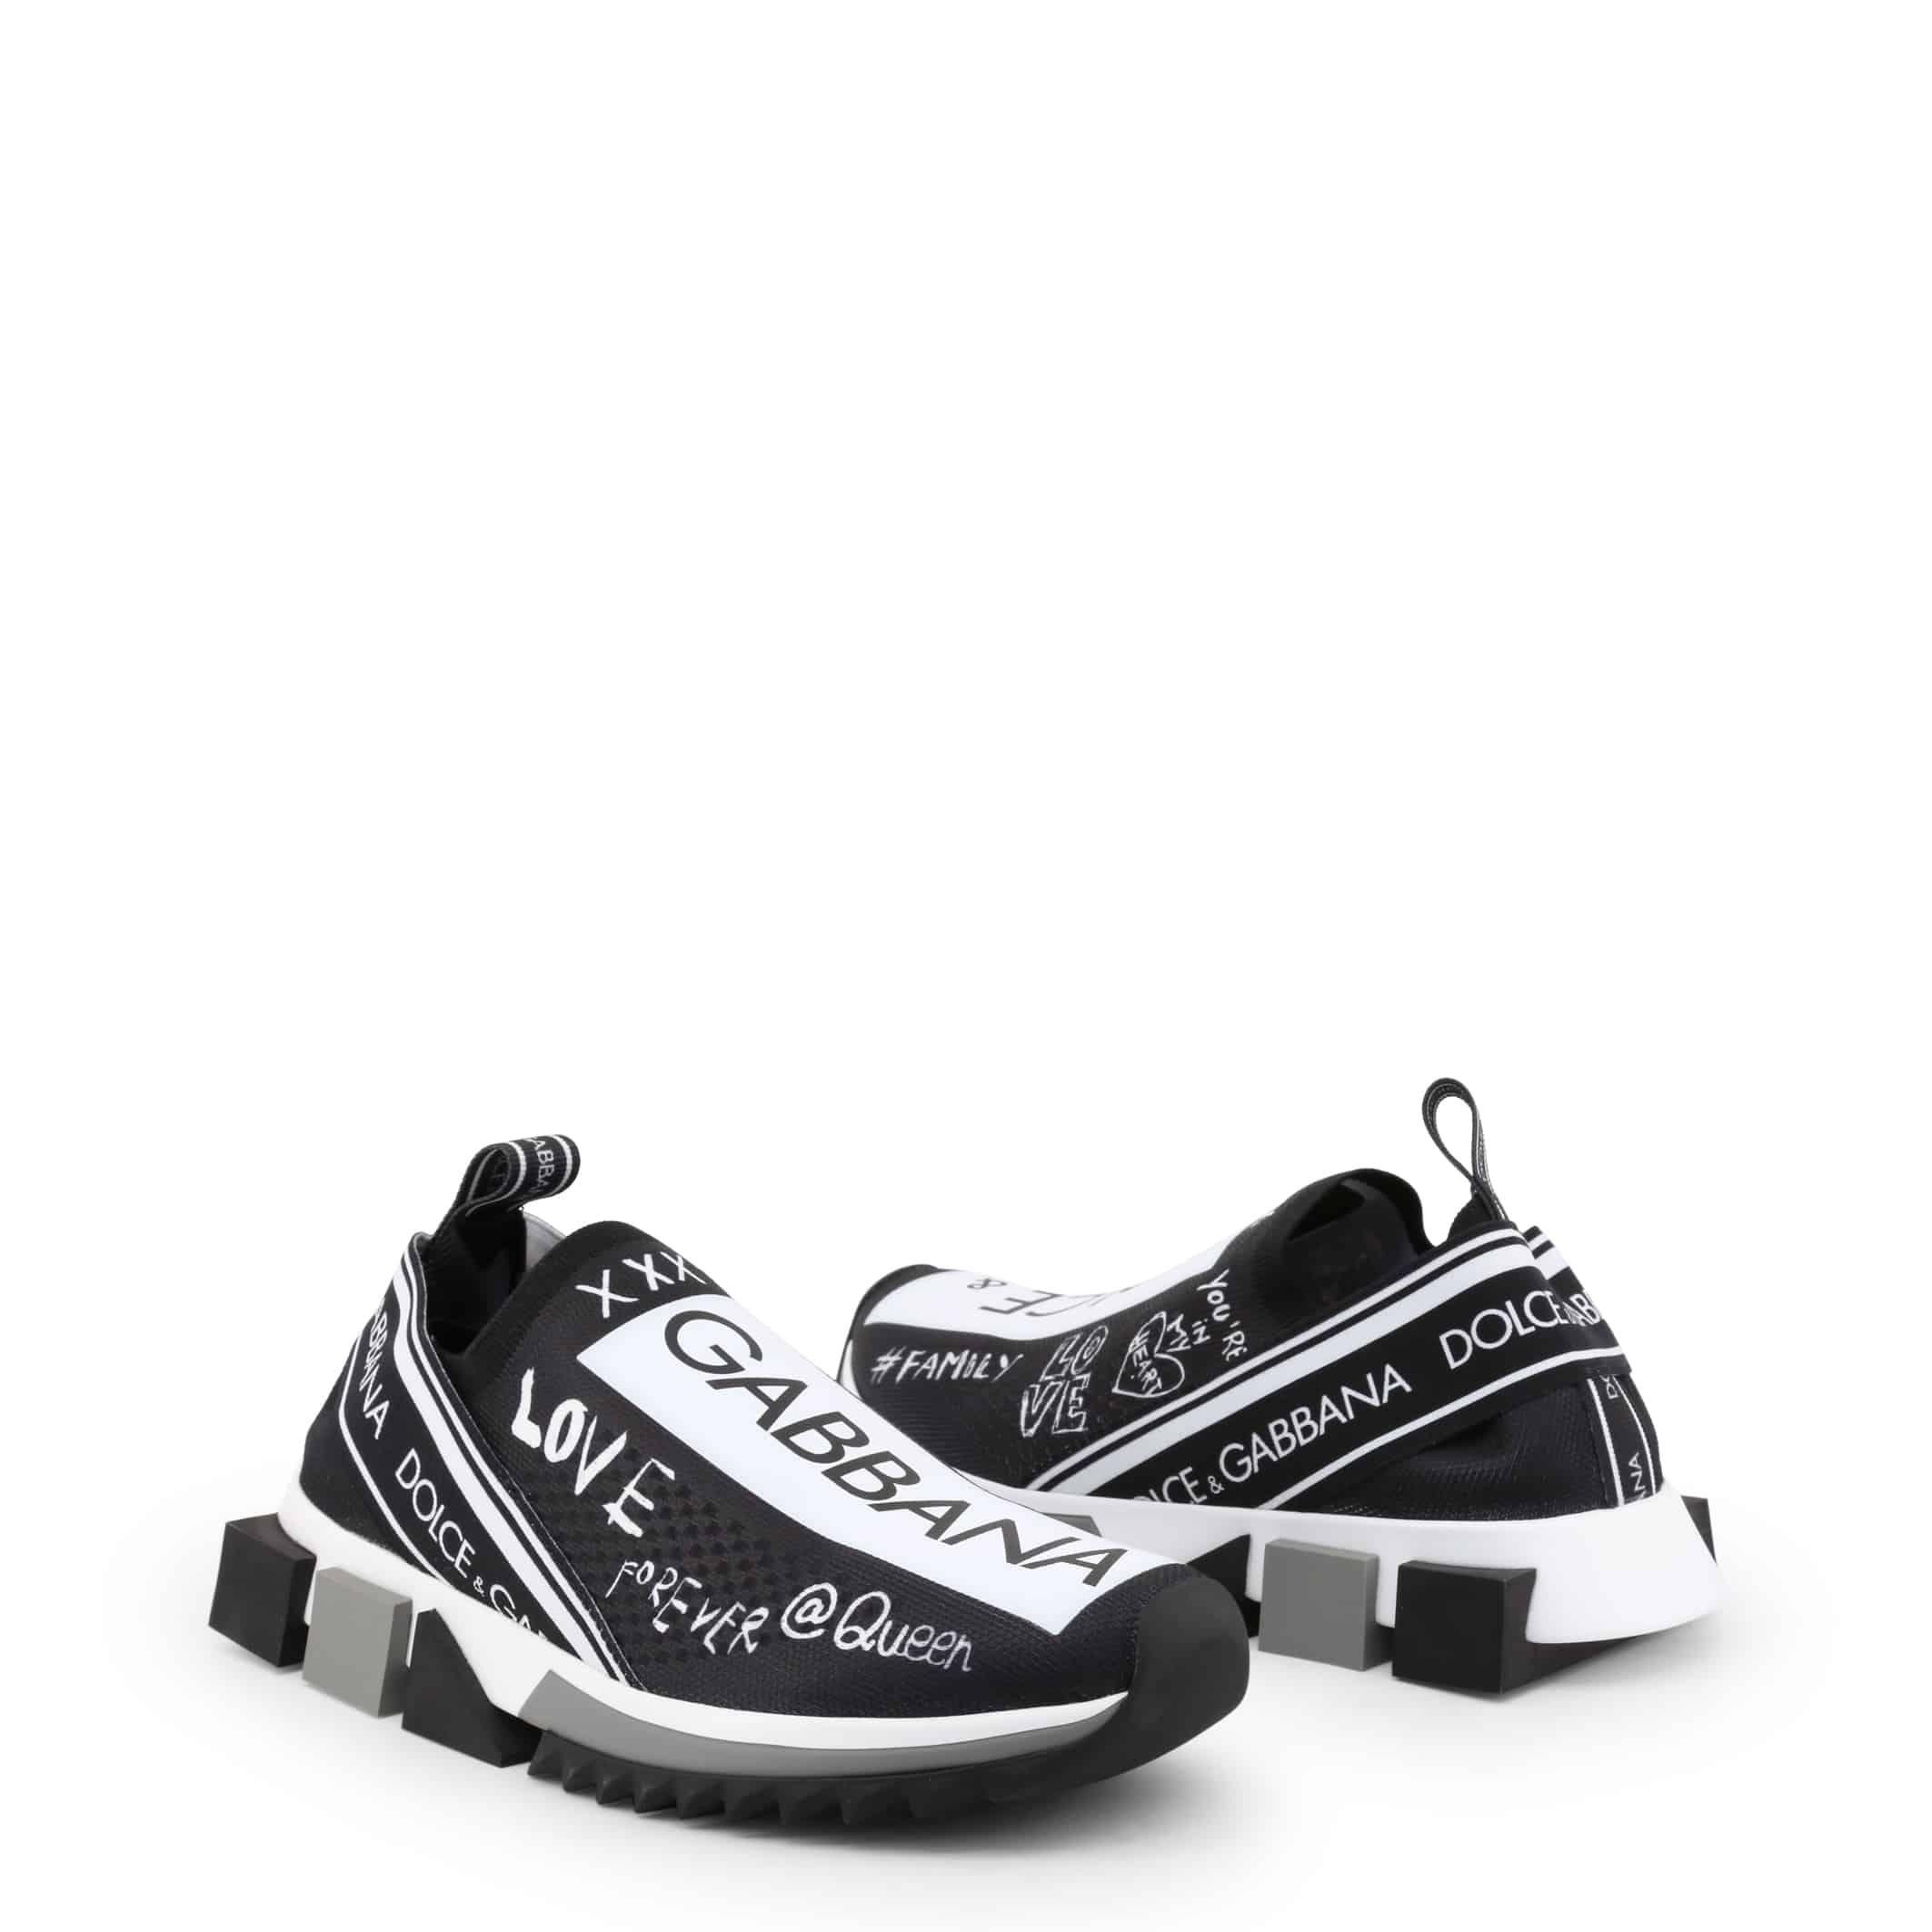 Dolce & Gabbana - CK1595_AV005  | You Fashion Outlet